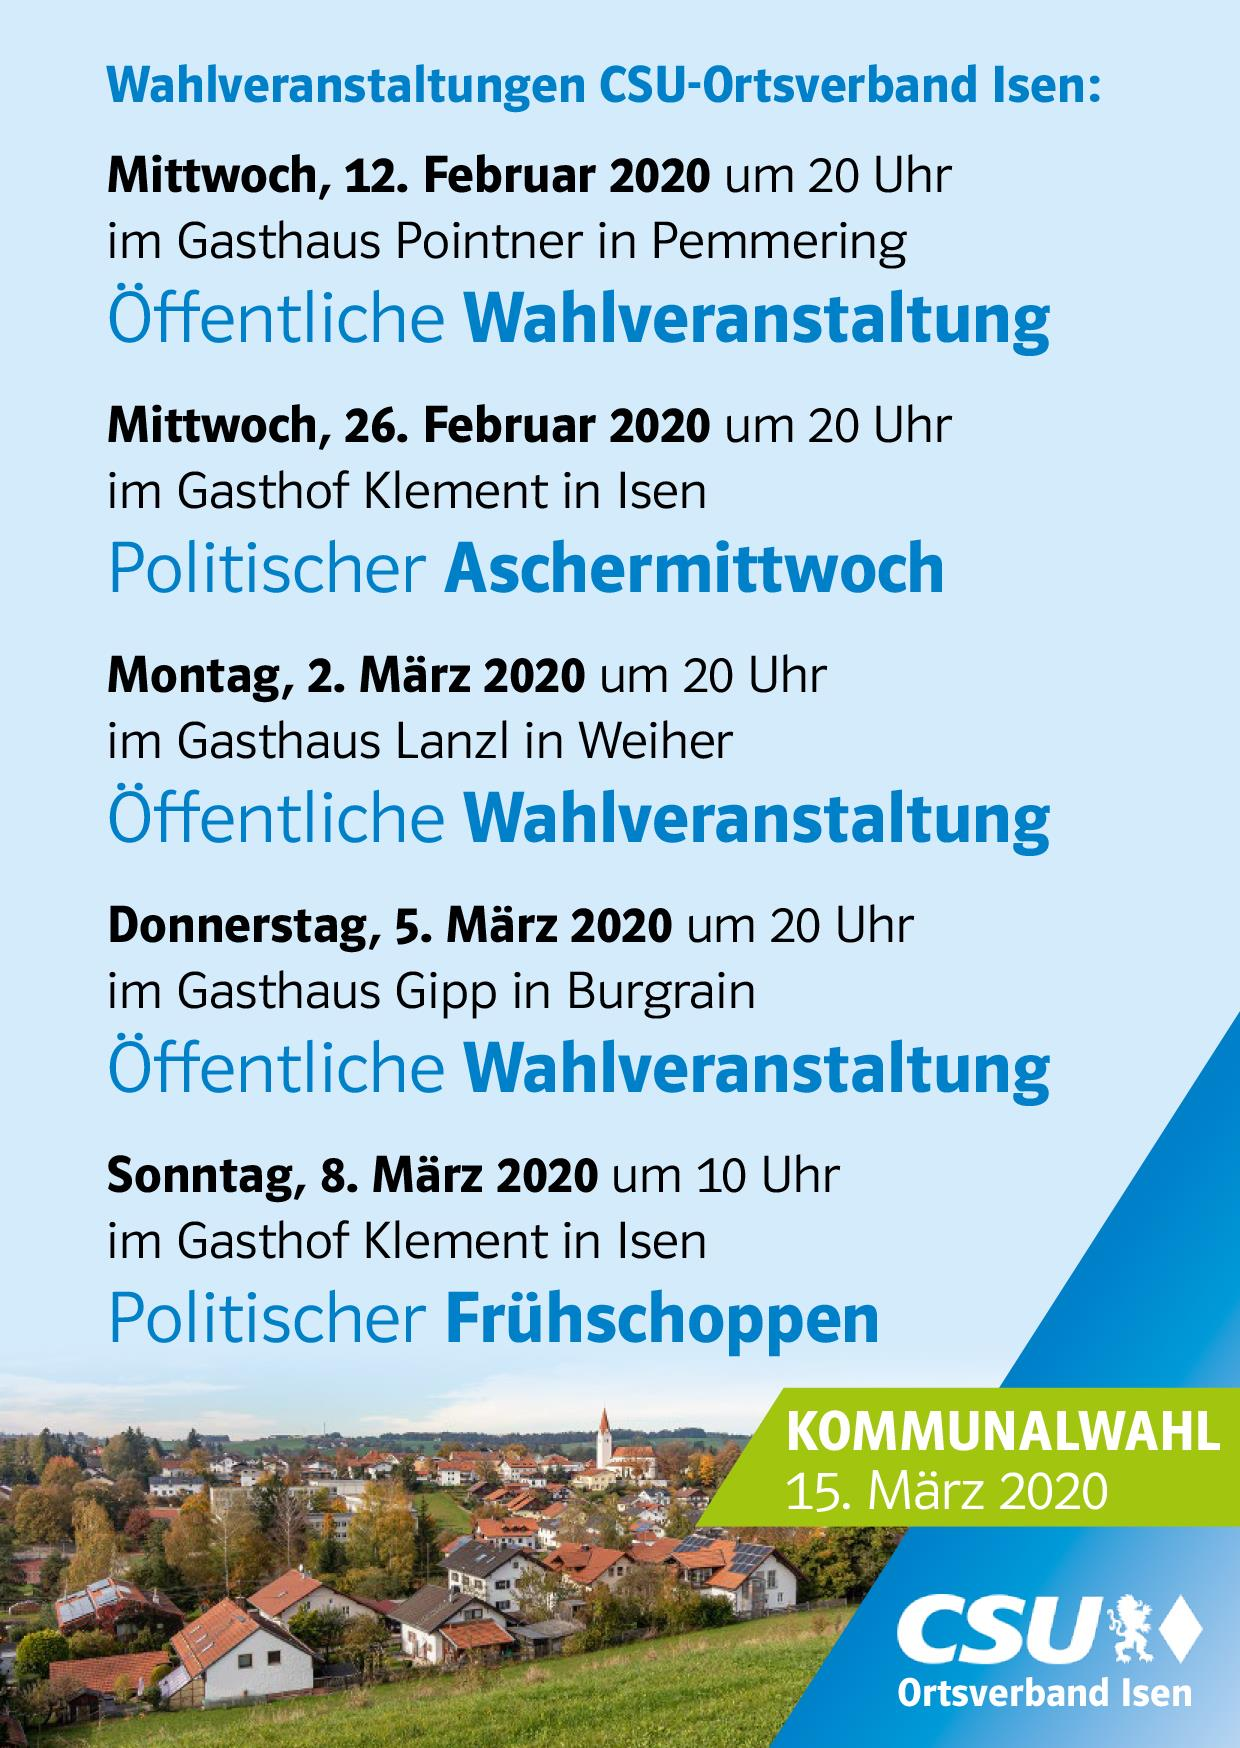 CSU-Wahlkampf-Veranstaltungen